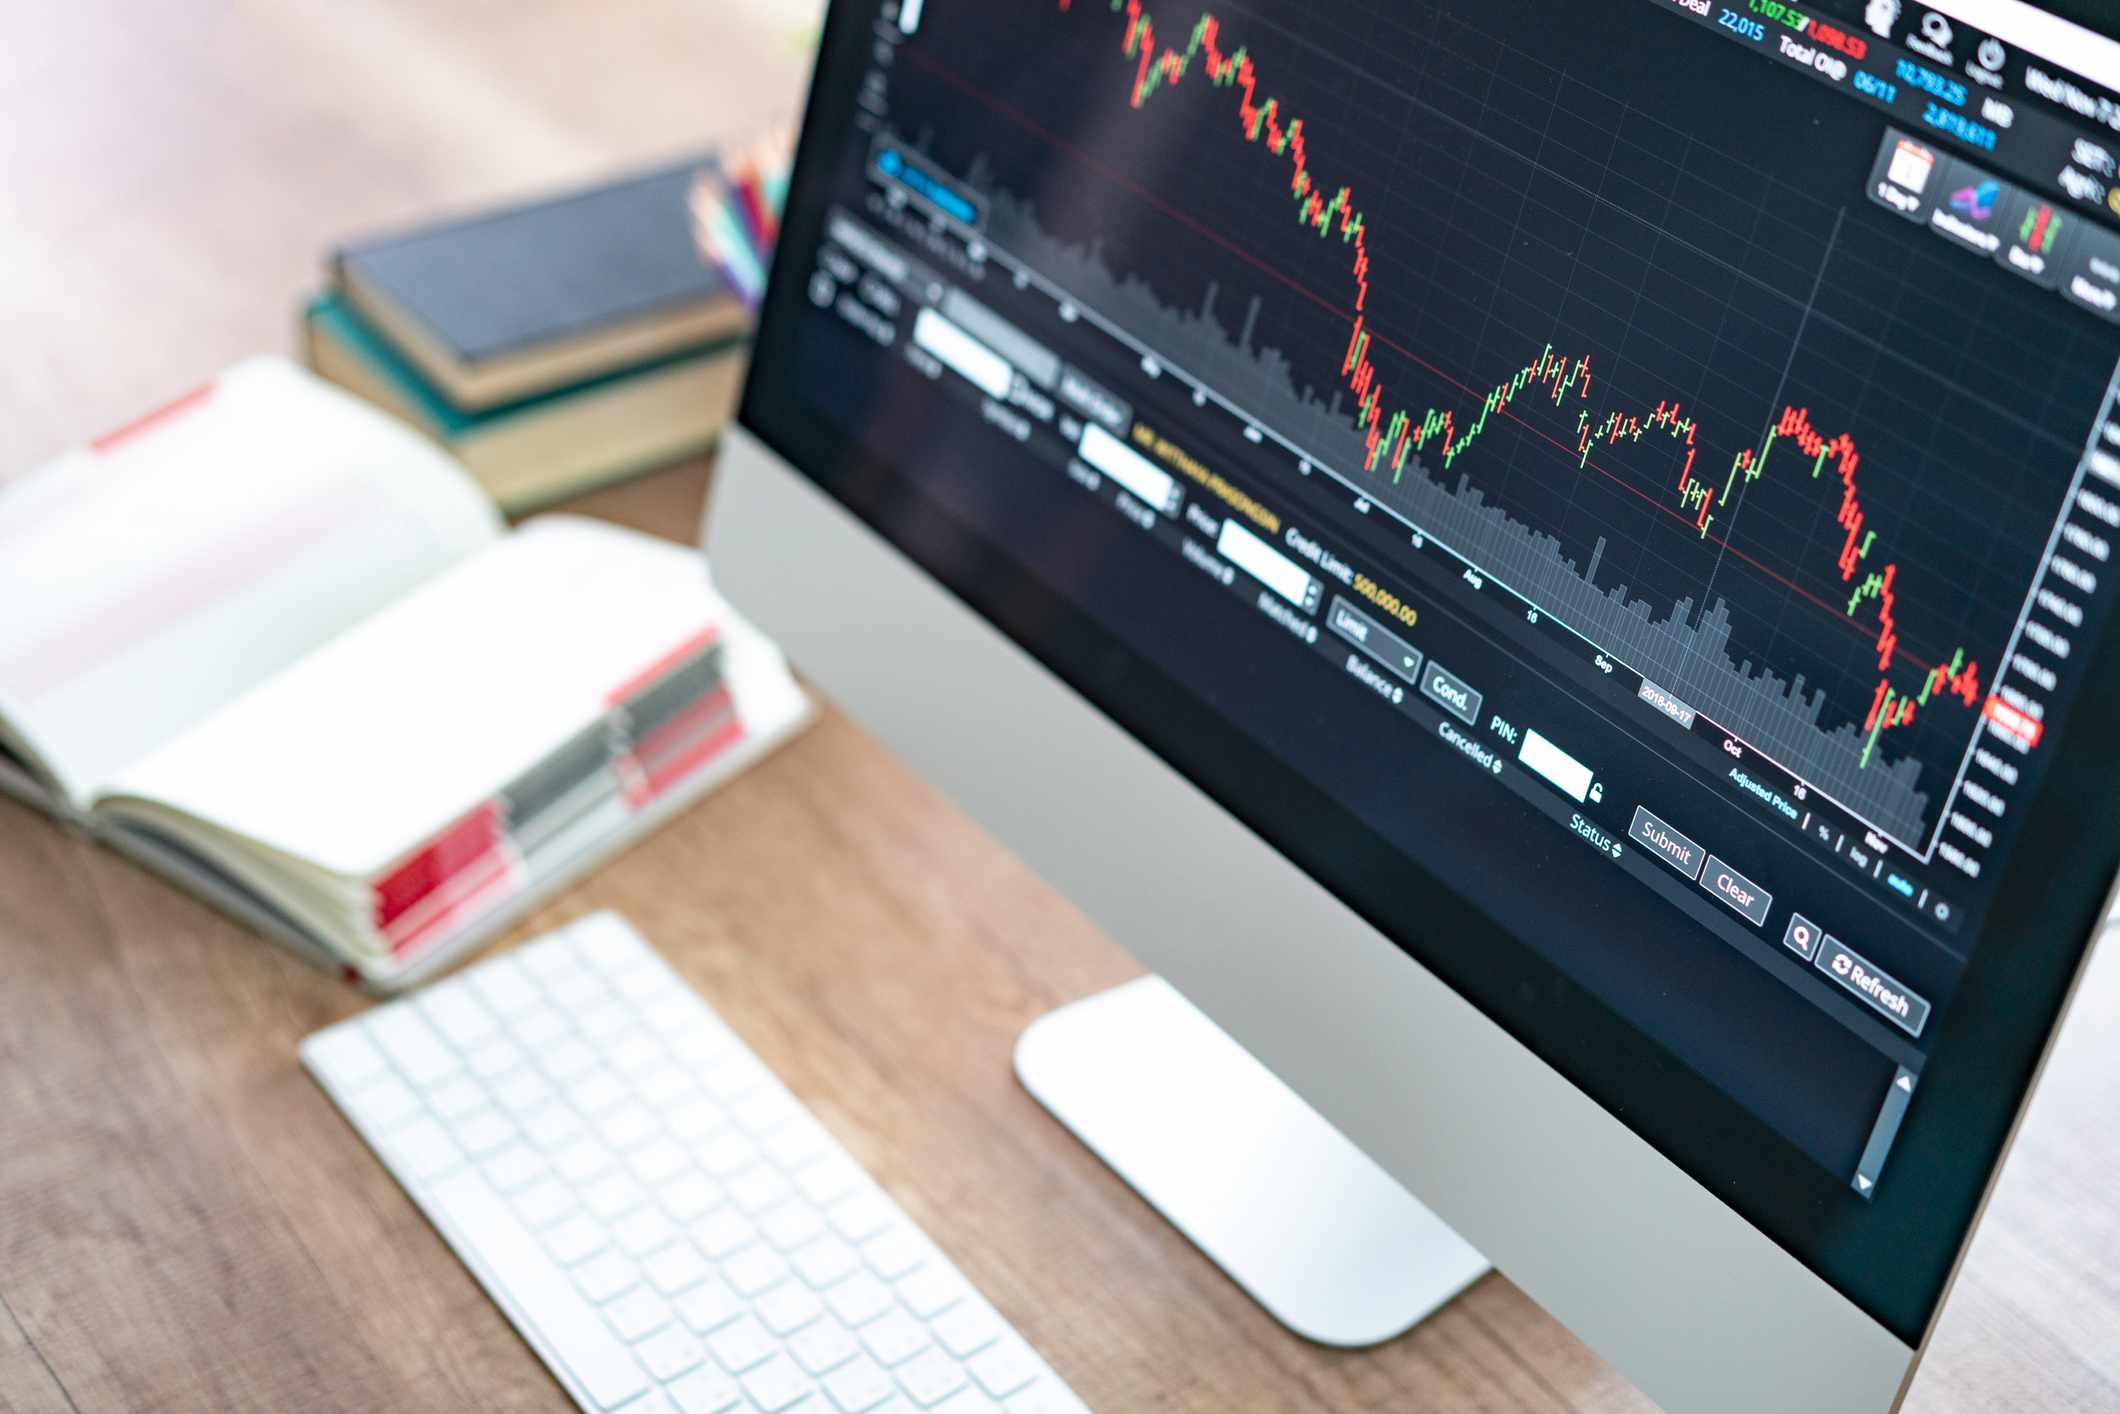 Trading Boom and Crash Markets